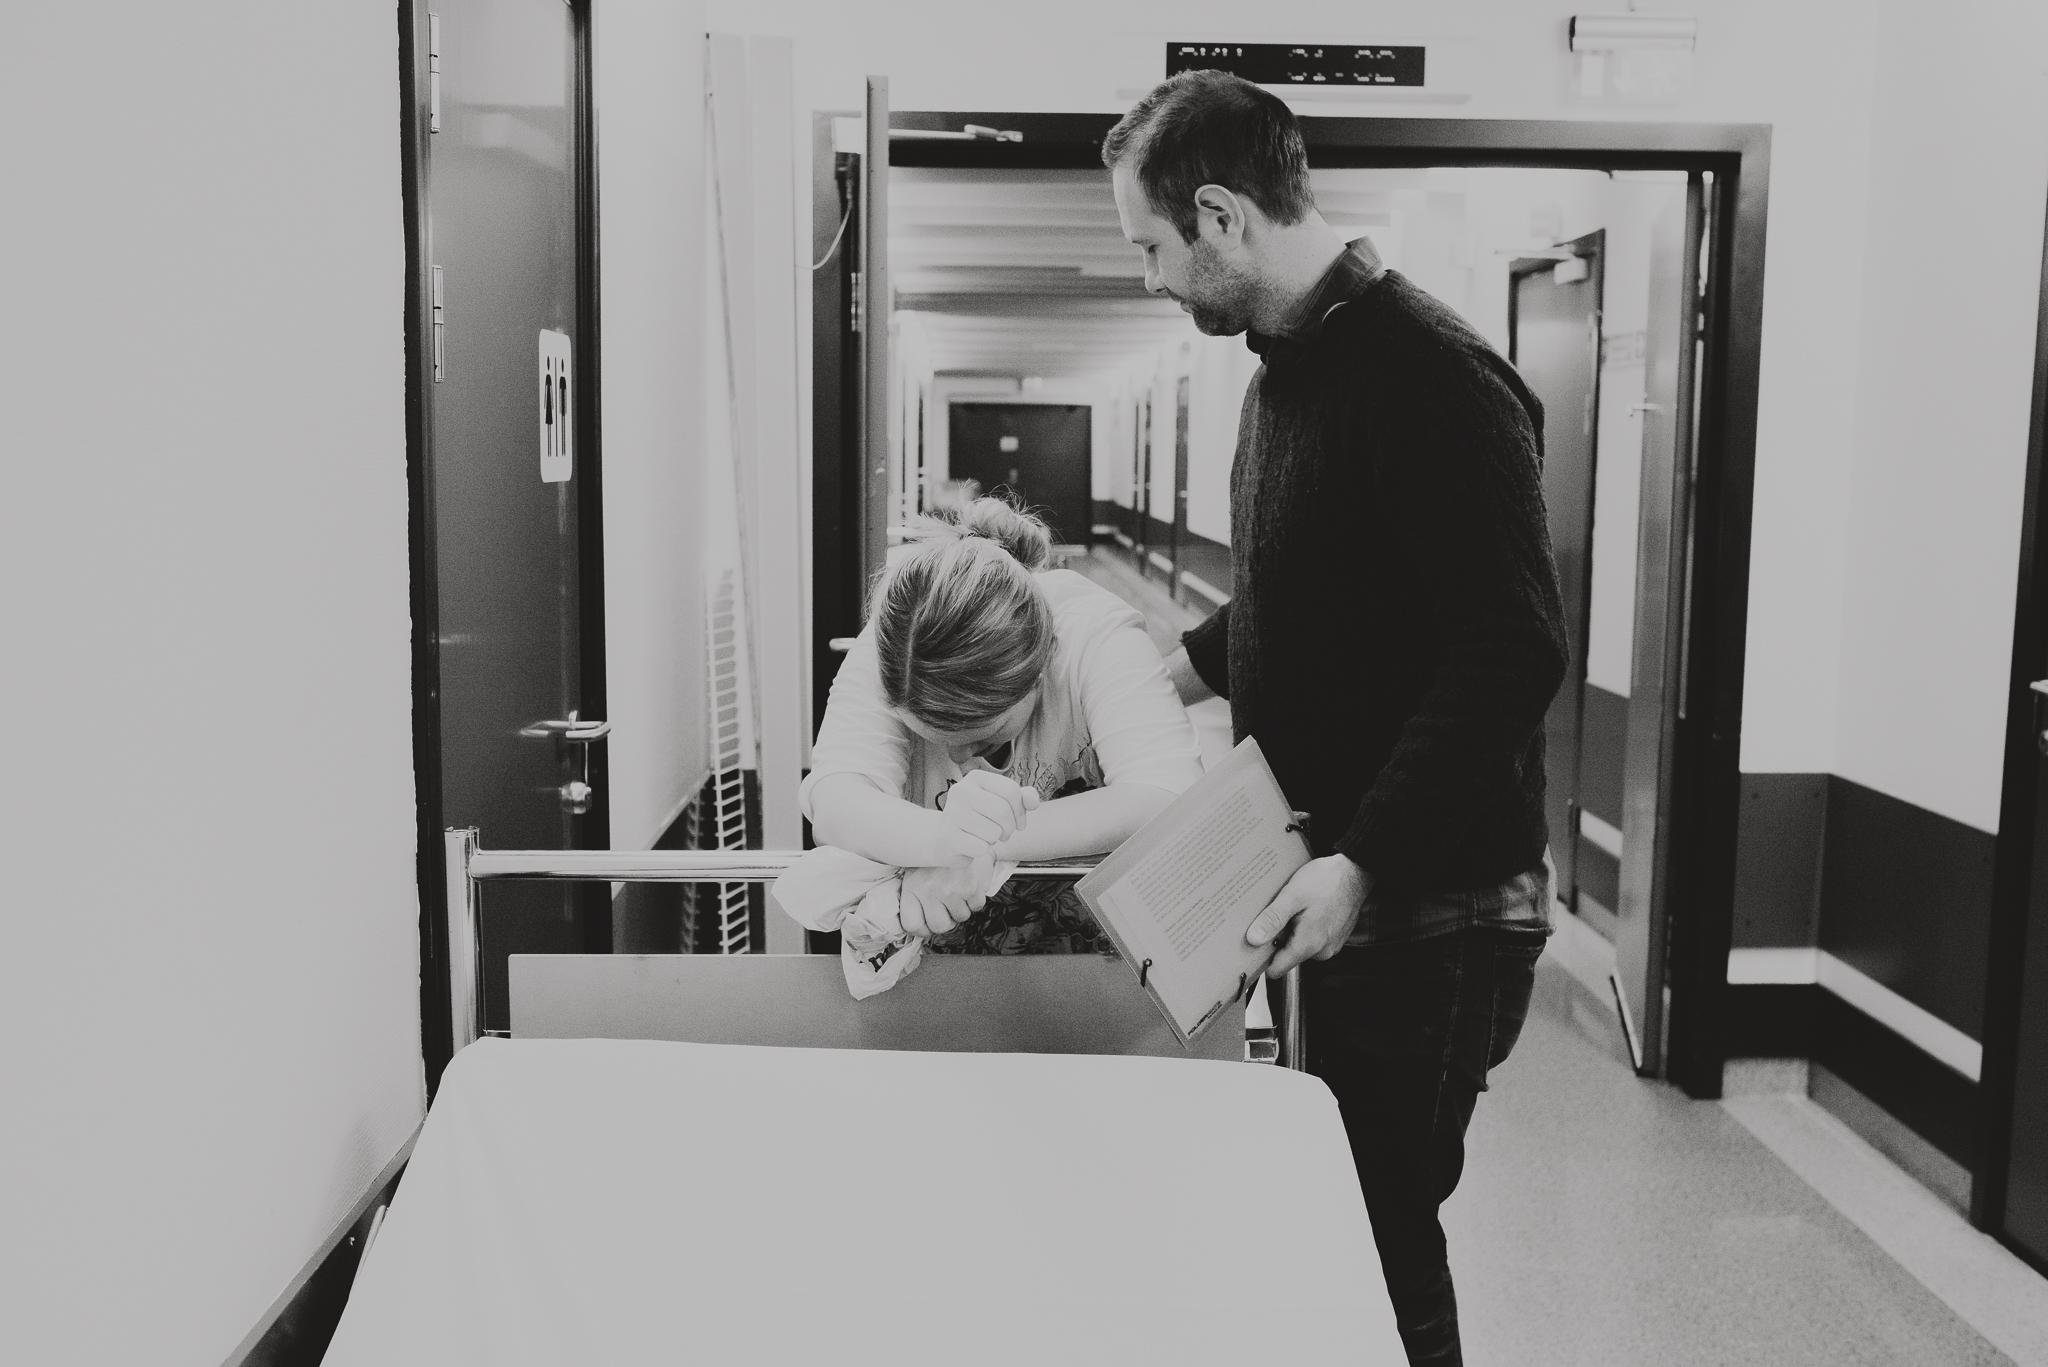 nyfødtfotografering-fødselsfotografering-babyfotografering-maria-vatne-kongsberg-oslo-10.jpg